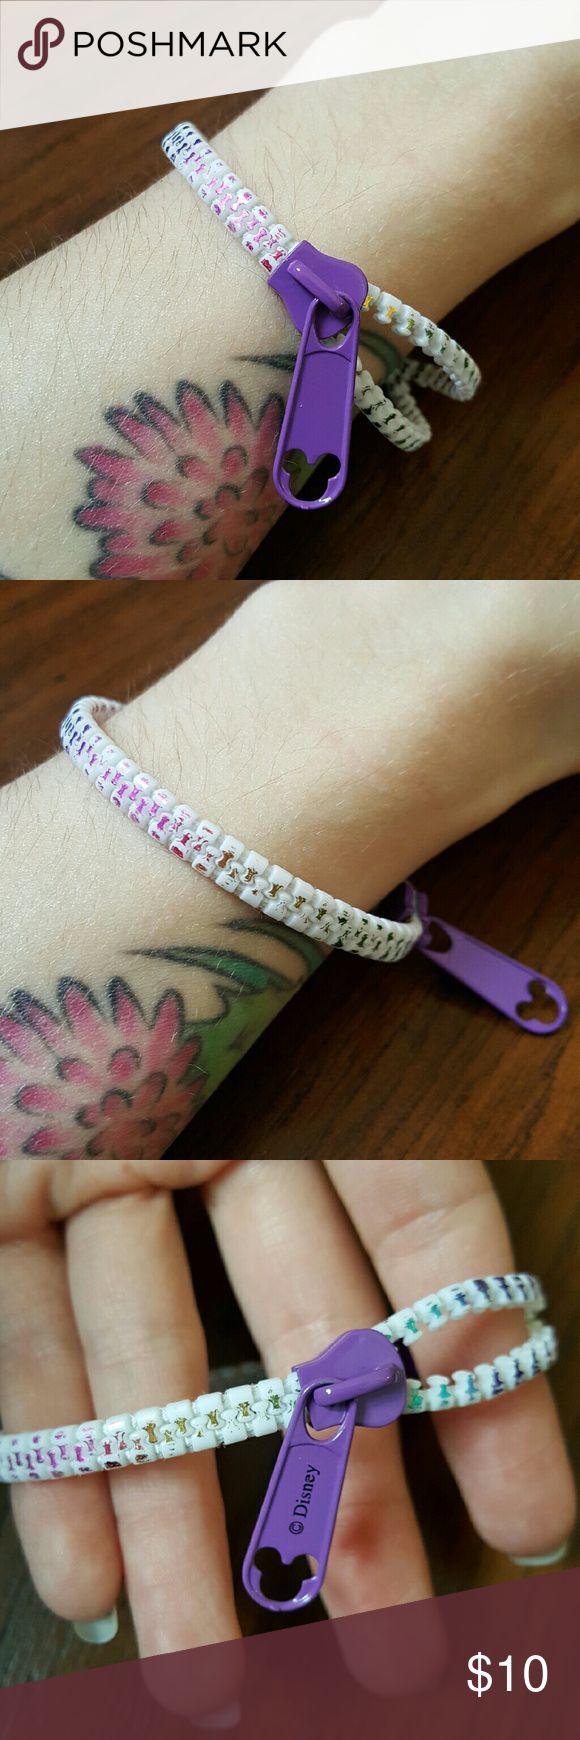 Disney Purple Zipper Bracelet Disney Purple Zipper Bracelet, plastic zipper with rainbow foil accents, snap closure. Disney Jewelry Bracelets